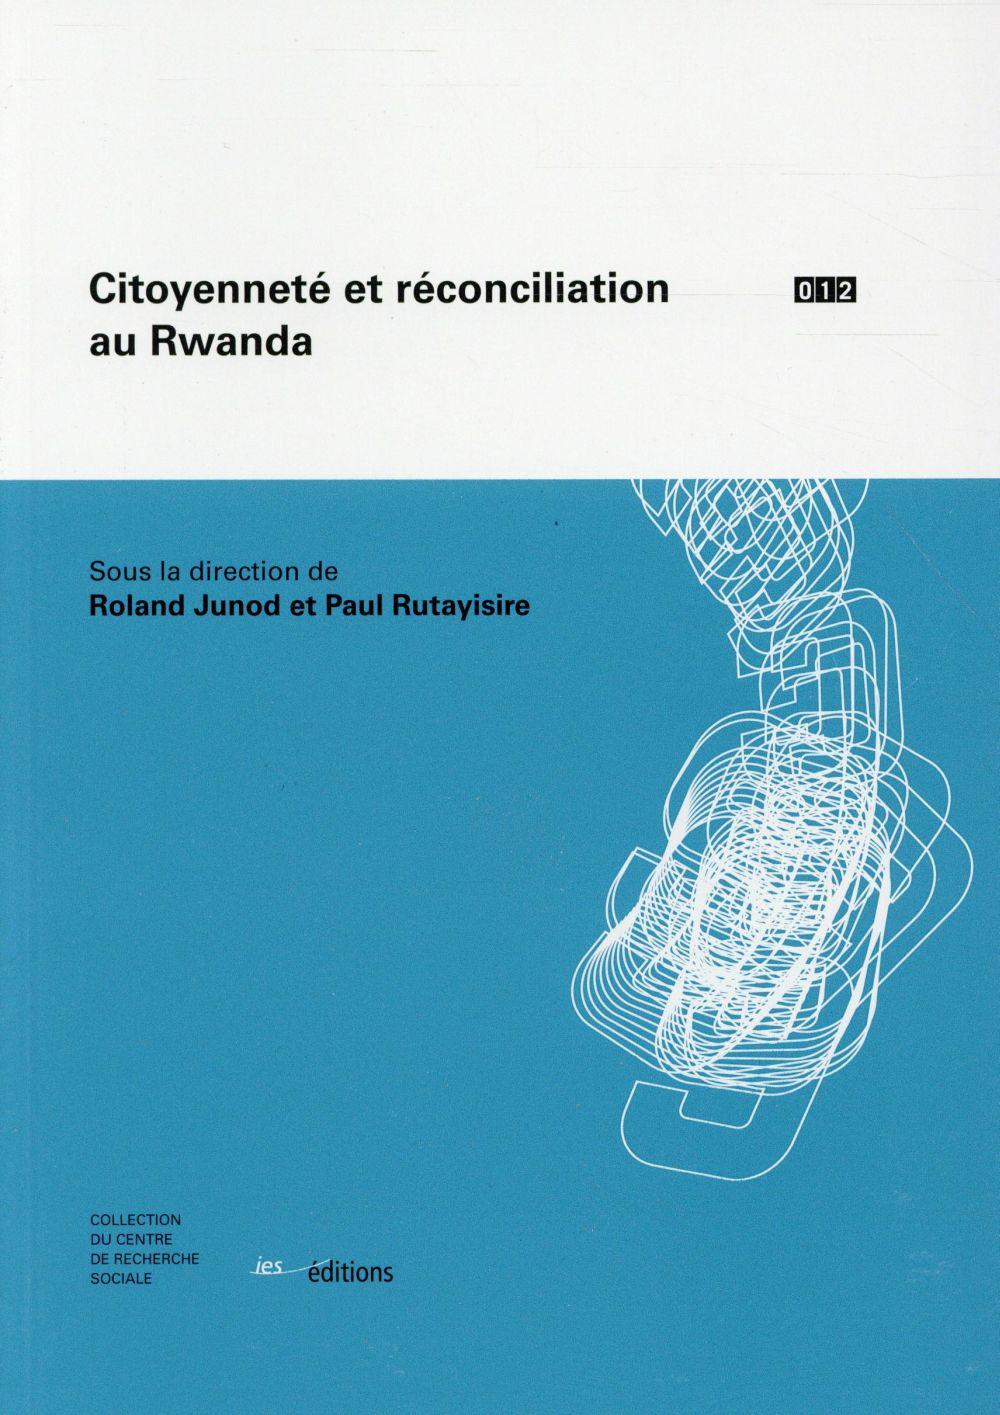 Citoyennete et reconciliation au rwanda